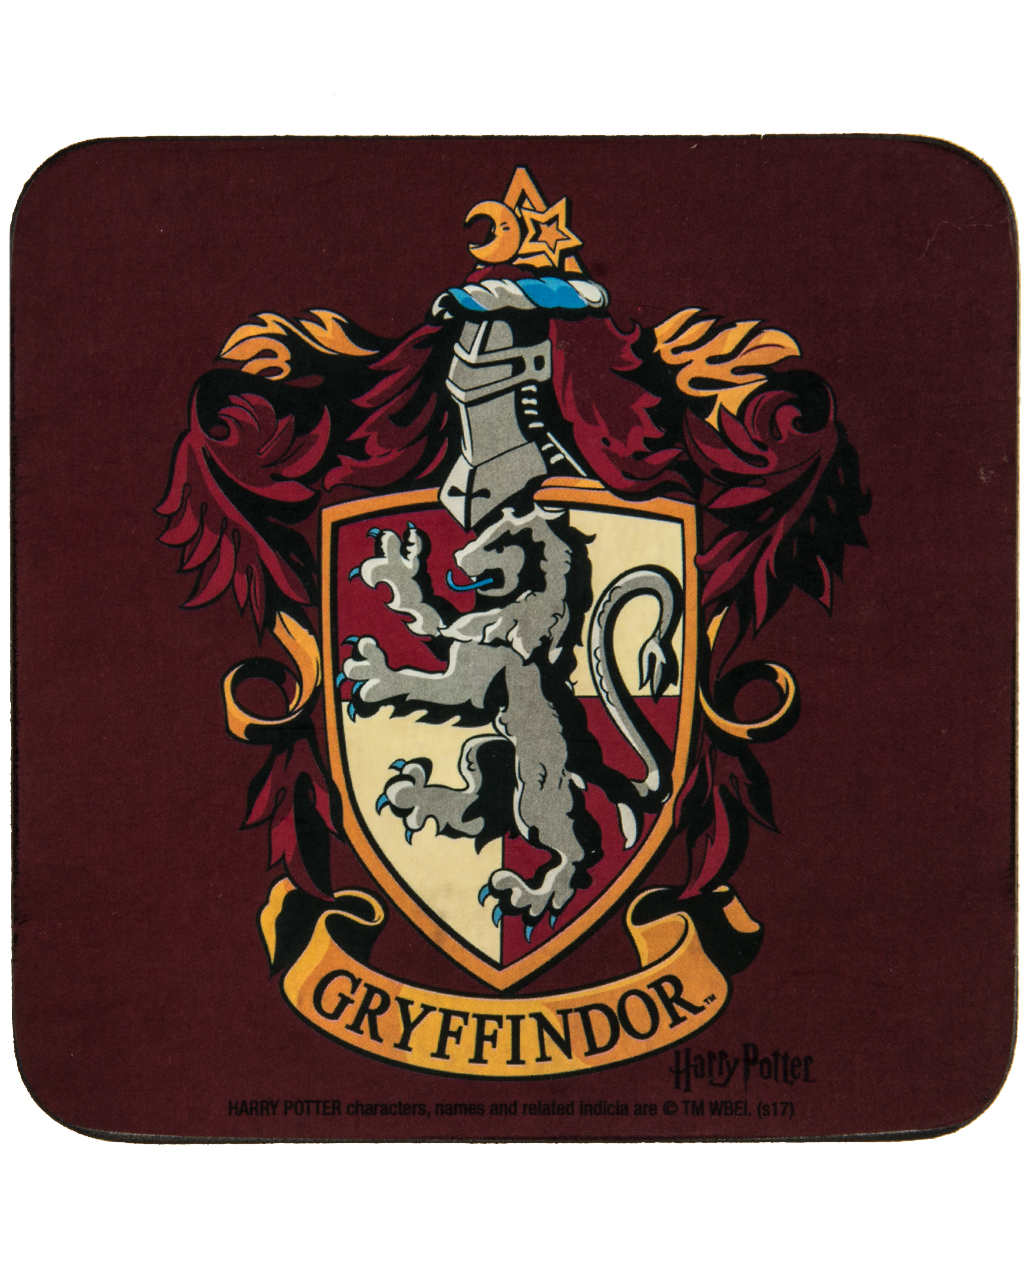 Harry Potter Gryffindor Coaster As A Present Horror Shop Com